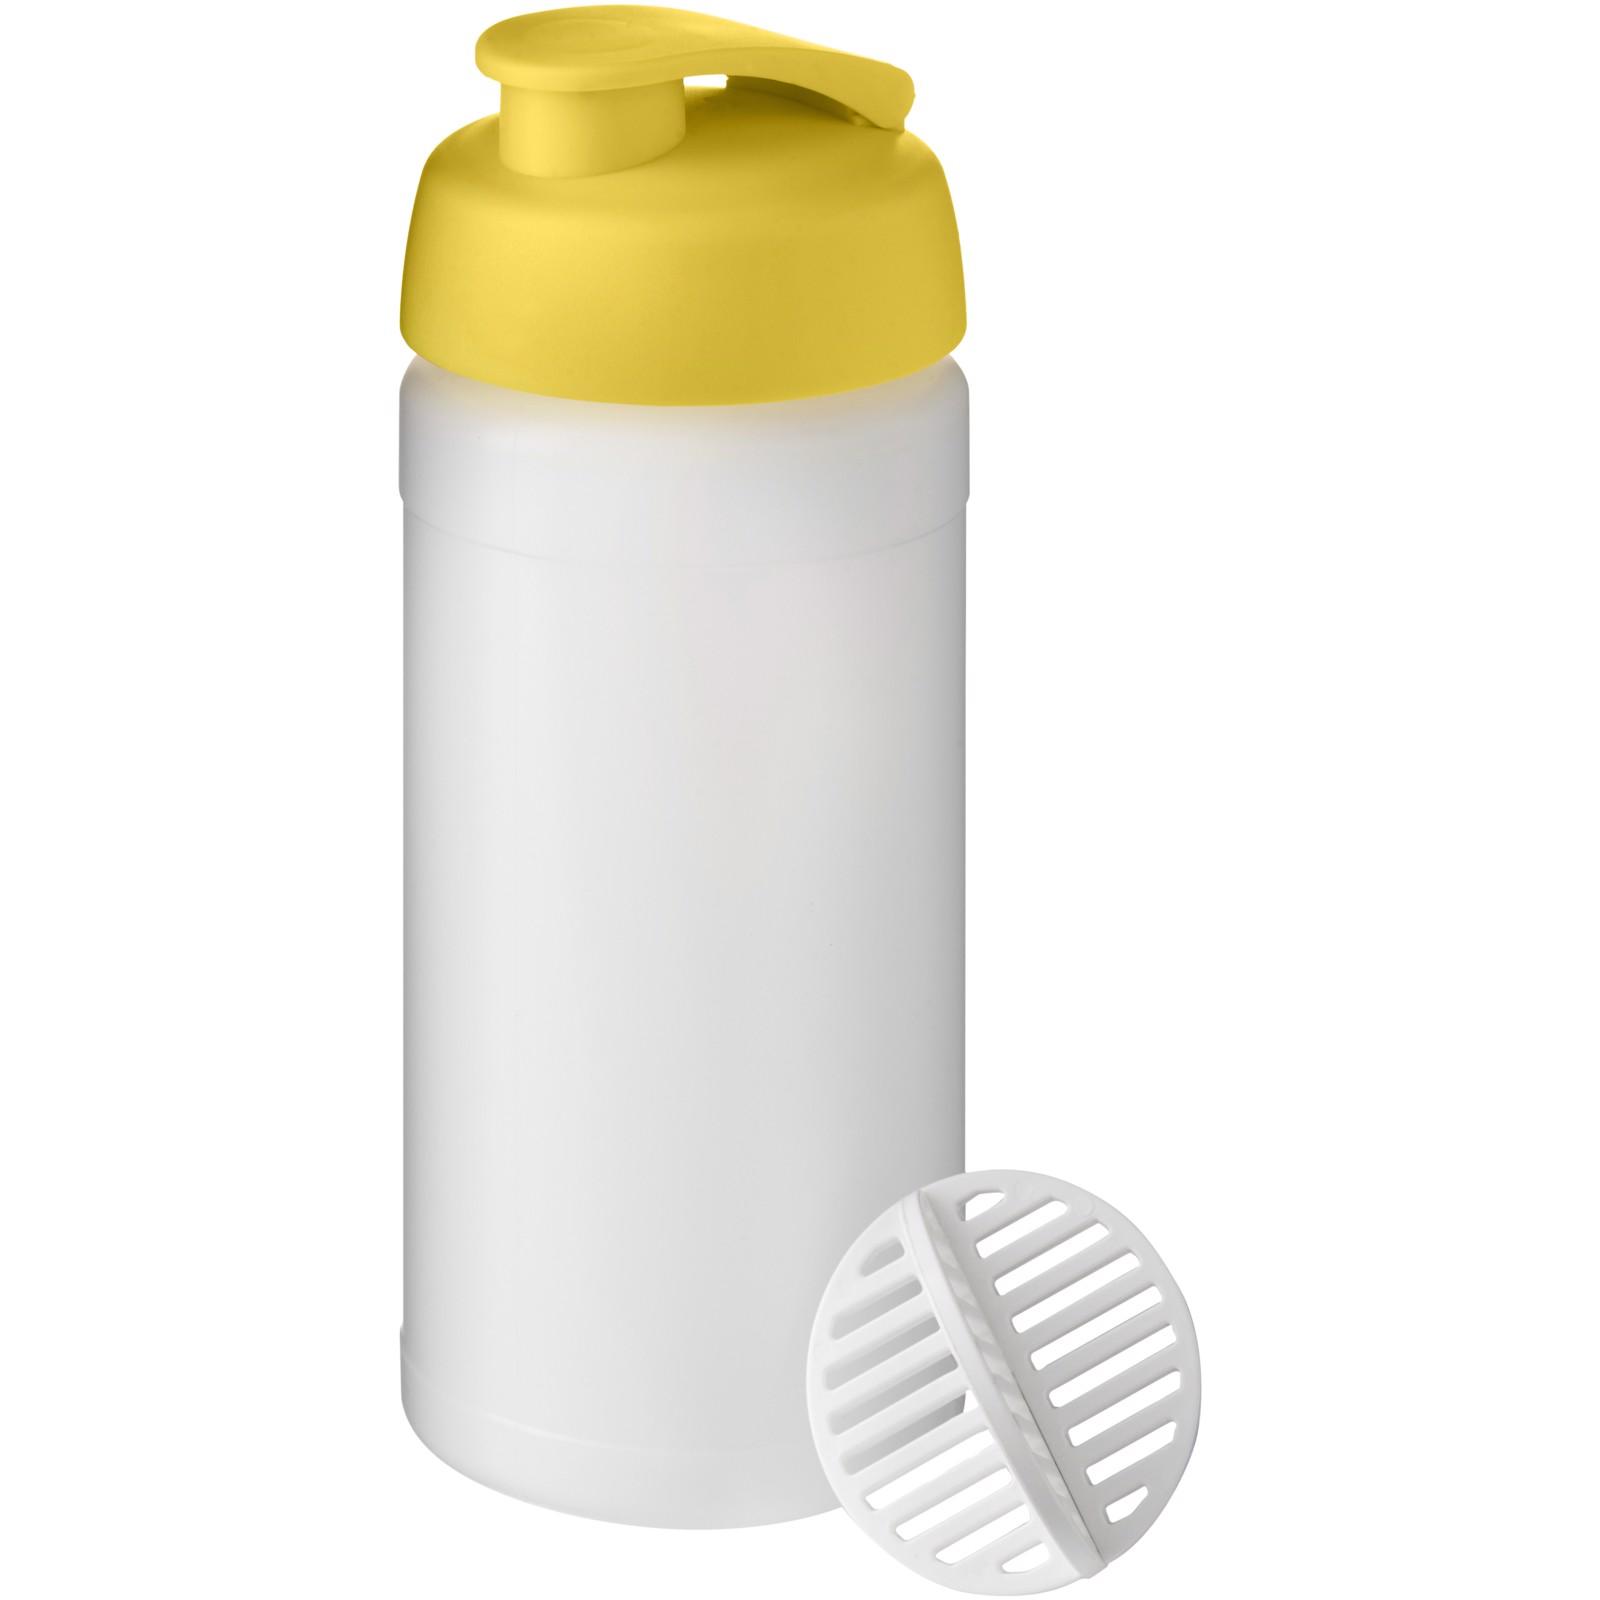 Baseline Plus 500 ml shaker bottle - Yellow / Frosted clear